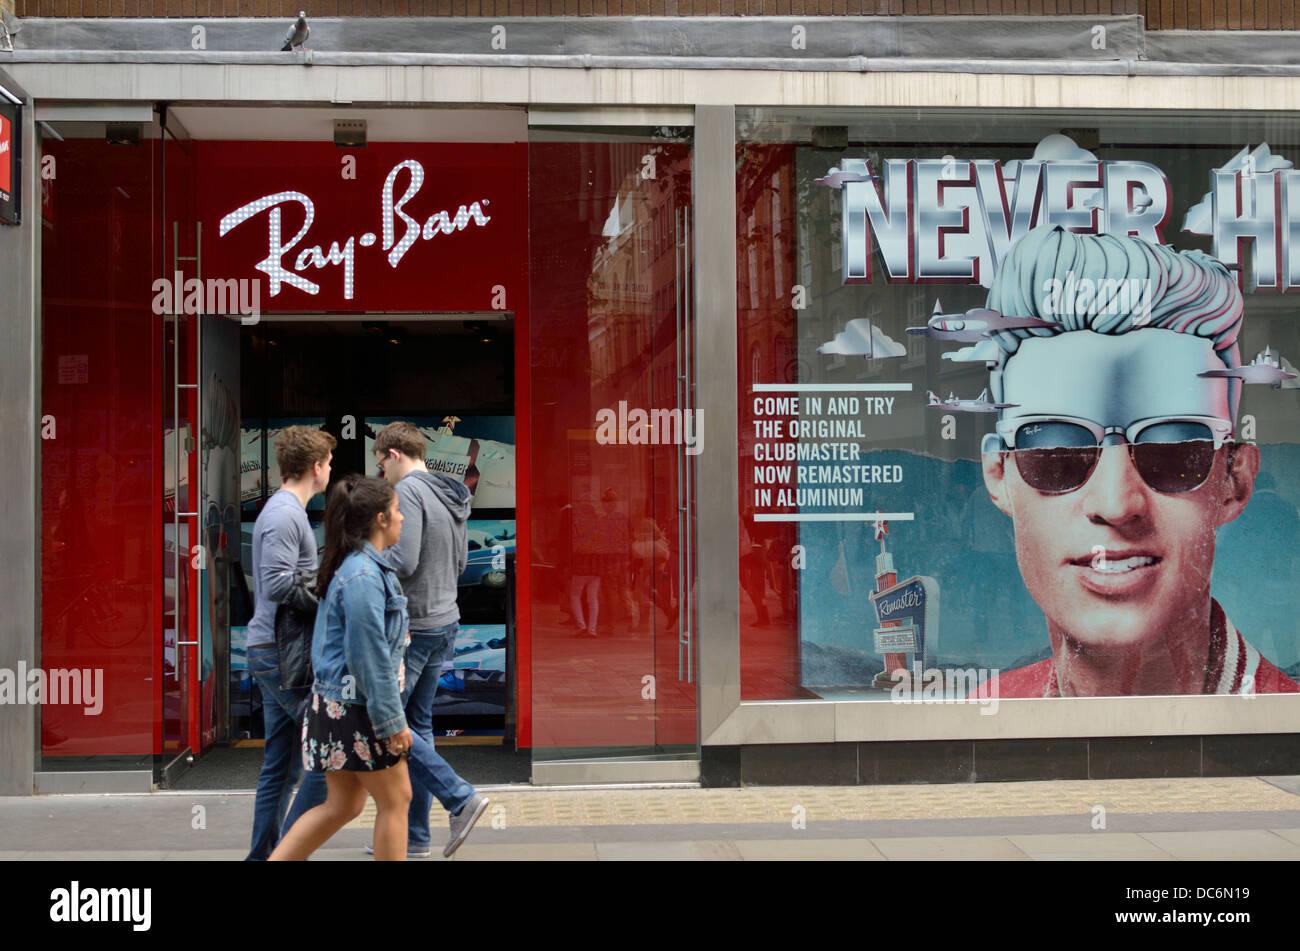 976ad7c96cc Ray Ban Shop In London « Heritage Malta